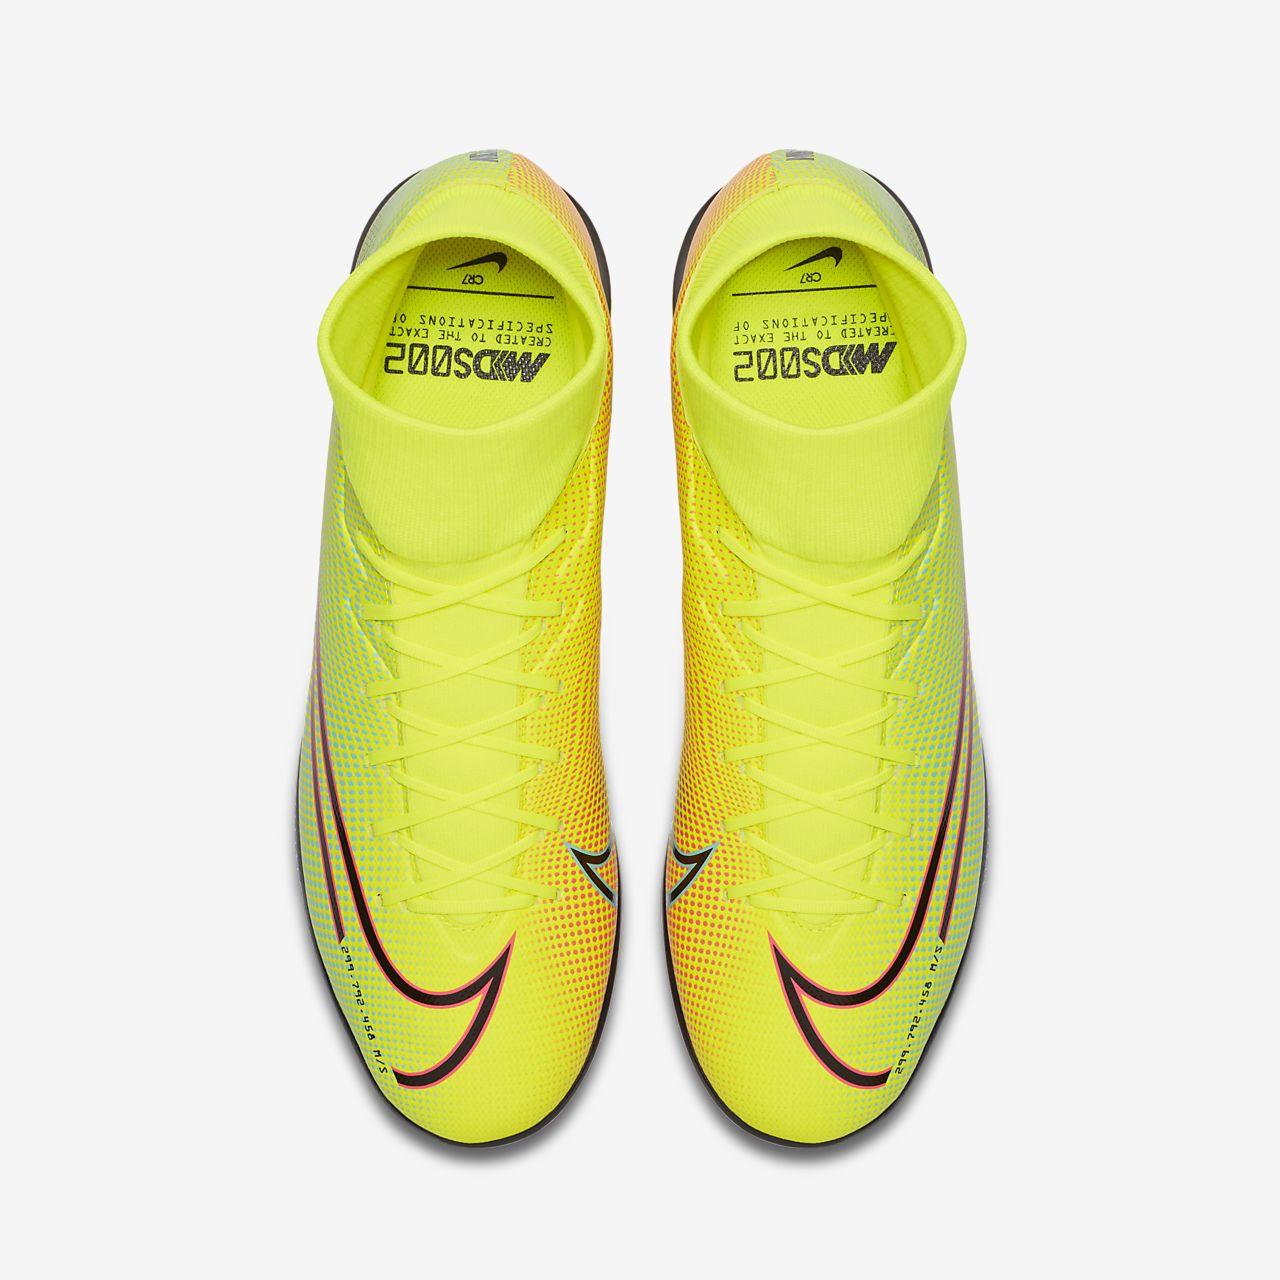 Sapatilhas de futsal Nike Mercurial Superfly 7 Academy MDS IC